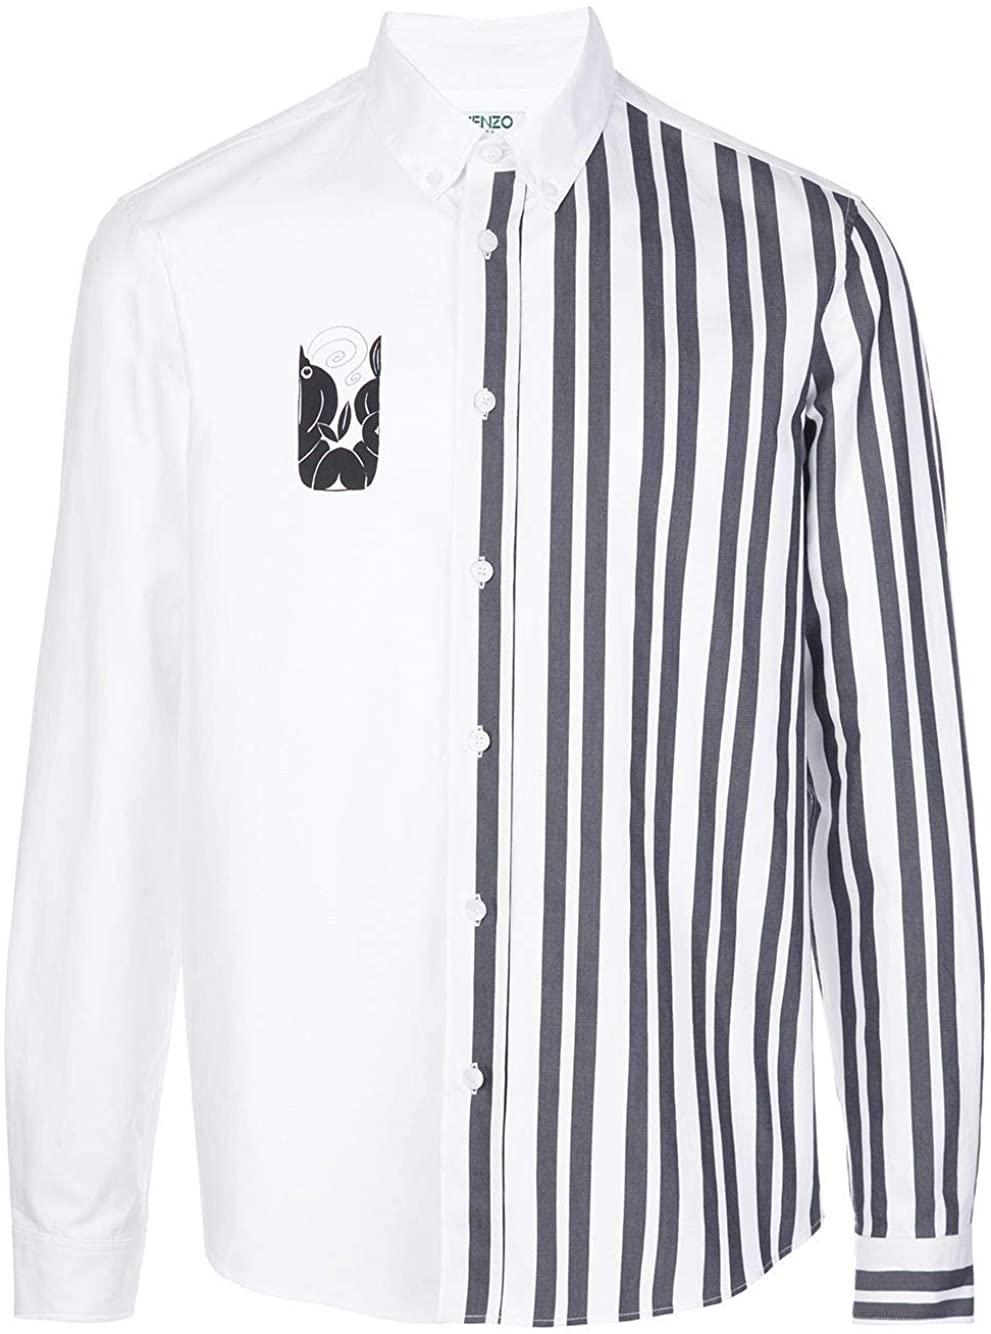 Kenzo Luxury Fashion Man FA55CH4141LB01 White Cotton Shirt | Spring Summer 20